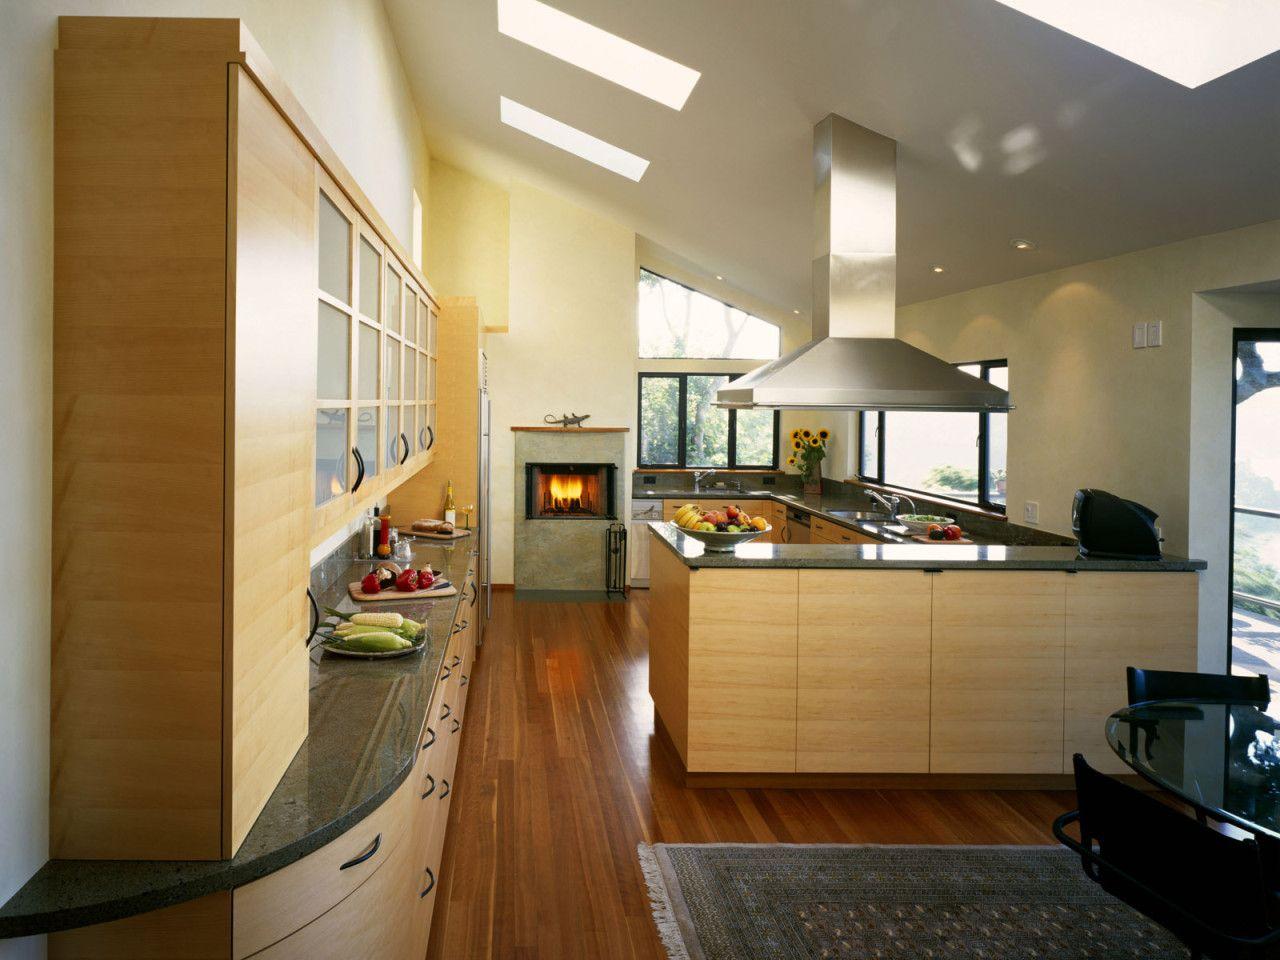 Kitchen Interior Design Tips 17 Best Images About Modern Kitchens On Pinterest Modern Kitchen